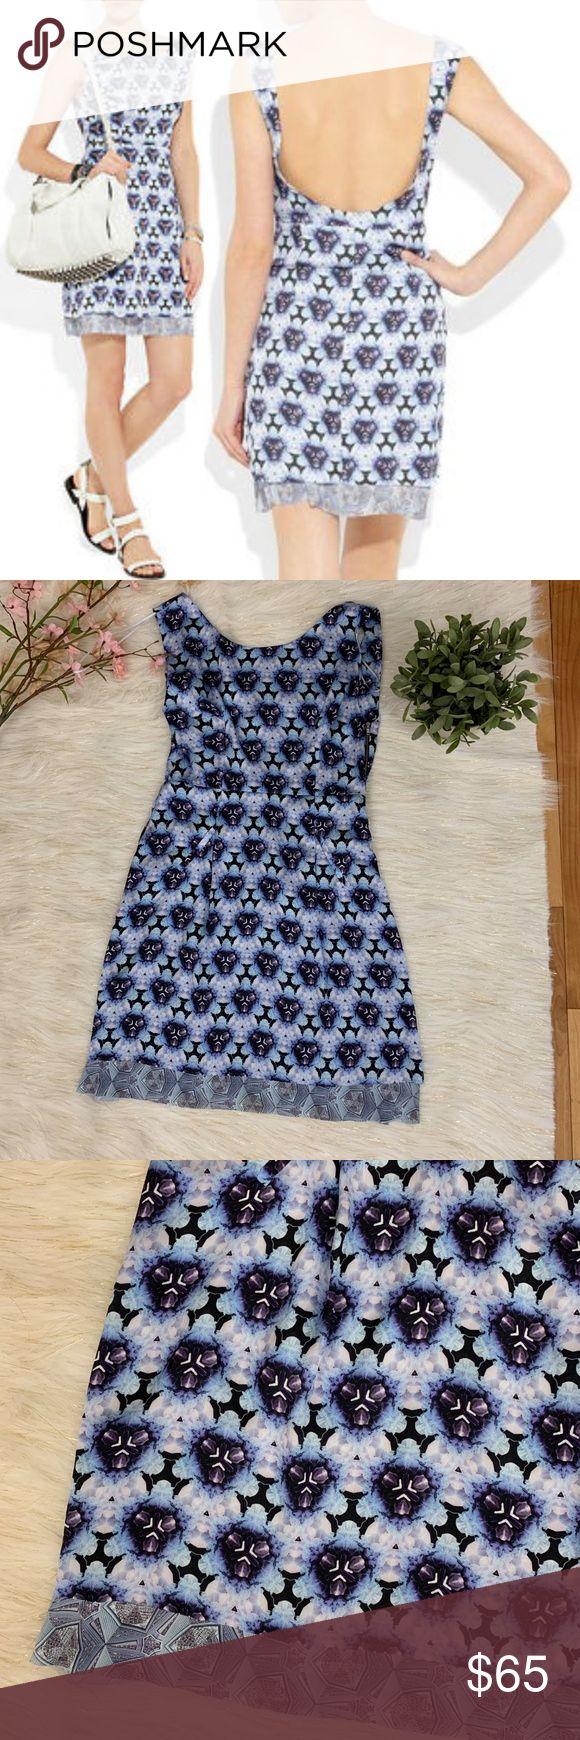 Acne Studios Betty Print Scoopback Dress Blue 38 Bundle Discount: 20% OFF 3+ ITE…